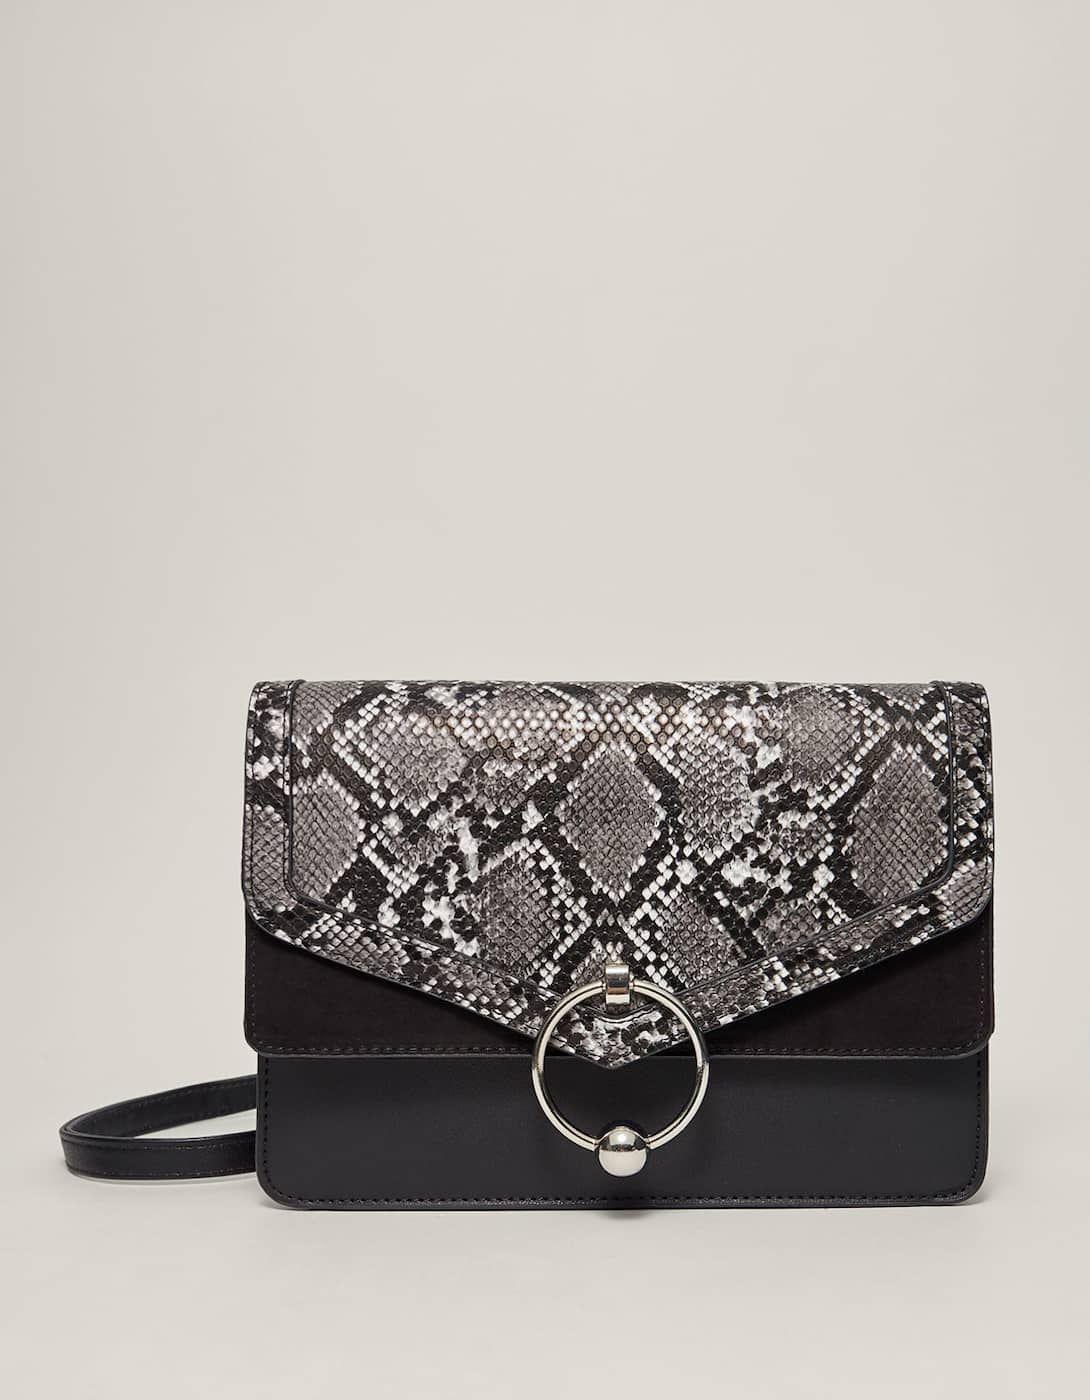 Ladies Designer Snakeskin Genuine Leather Bag Shoulder handbags Girls Crossbody